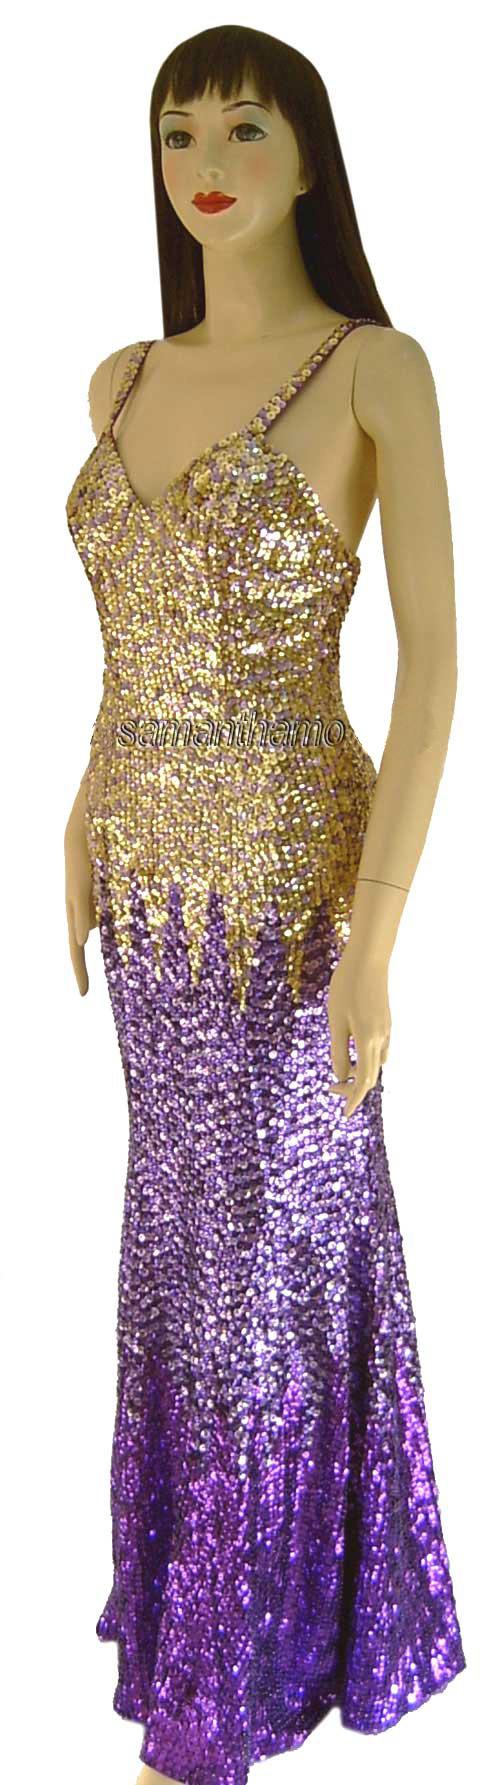 https://michaeljacksoncelebrityclothing.com/sequin-drag-ball-gown/TM5056-sequin-gowm.jpg